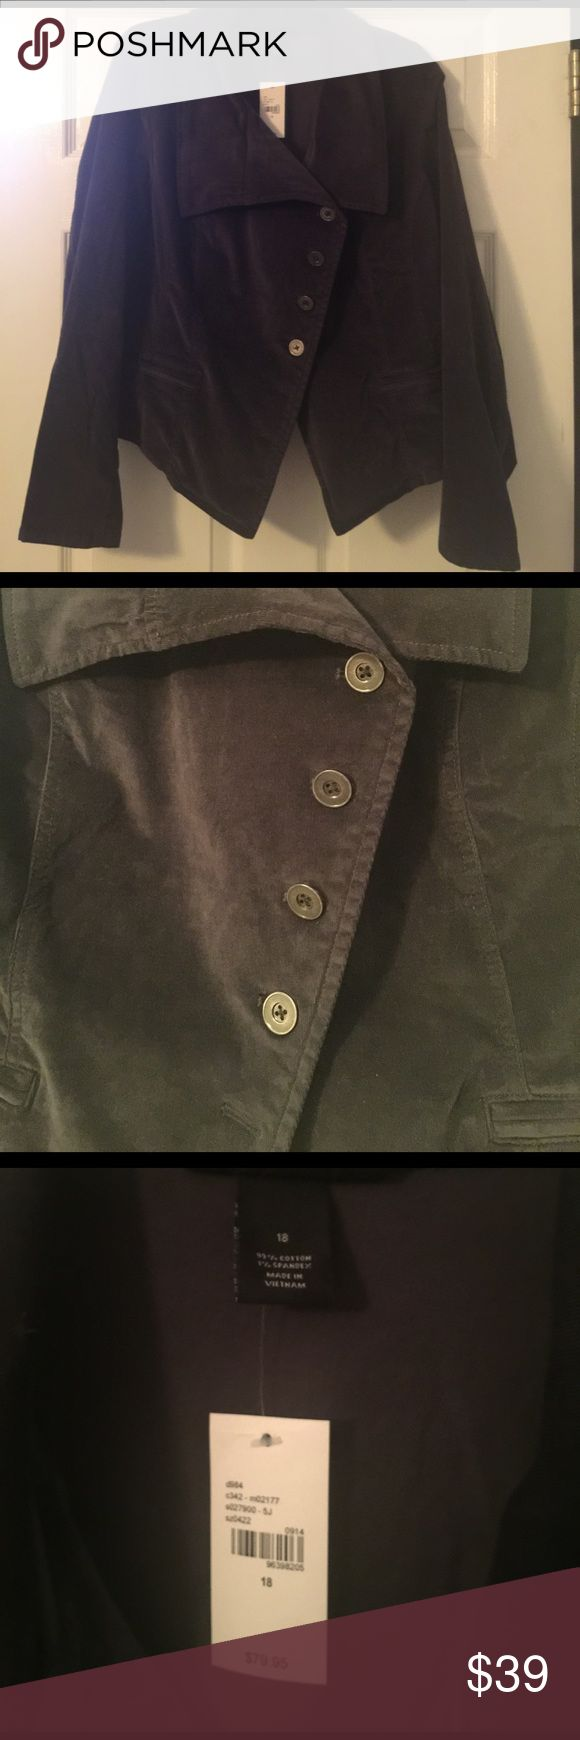 Lane Bryant Woman's Purple Blazer Size 18/20 Stretchy yet structured purple blazer with an asymmetrical button front. Lane Bryant Jackets & Coats Blazers